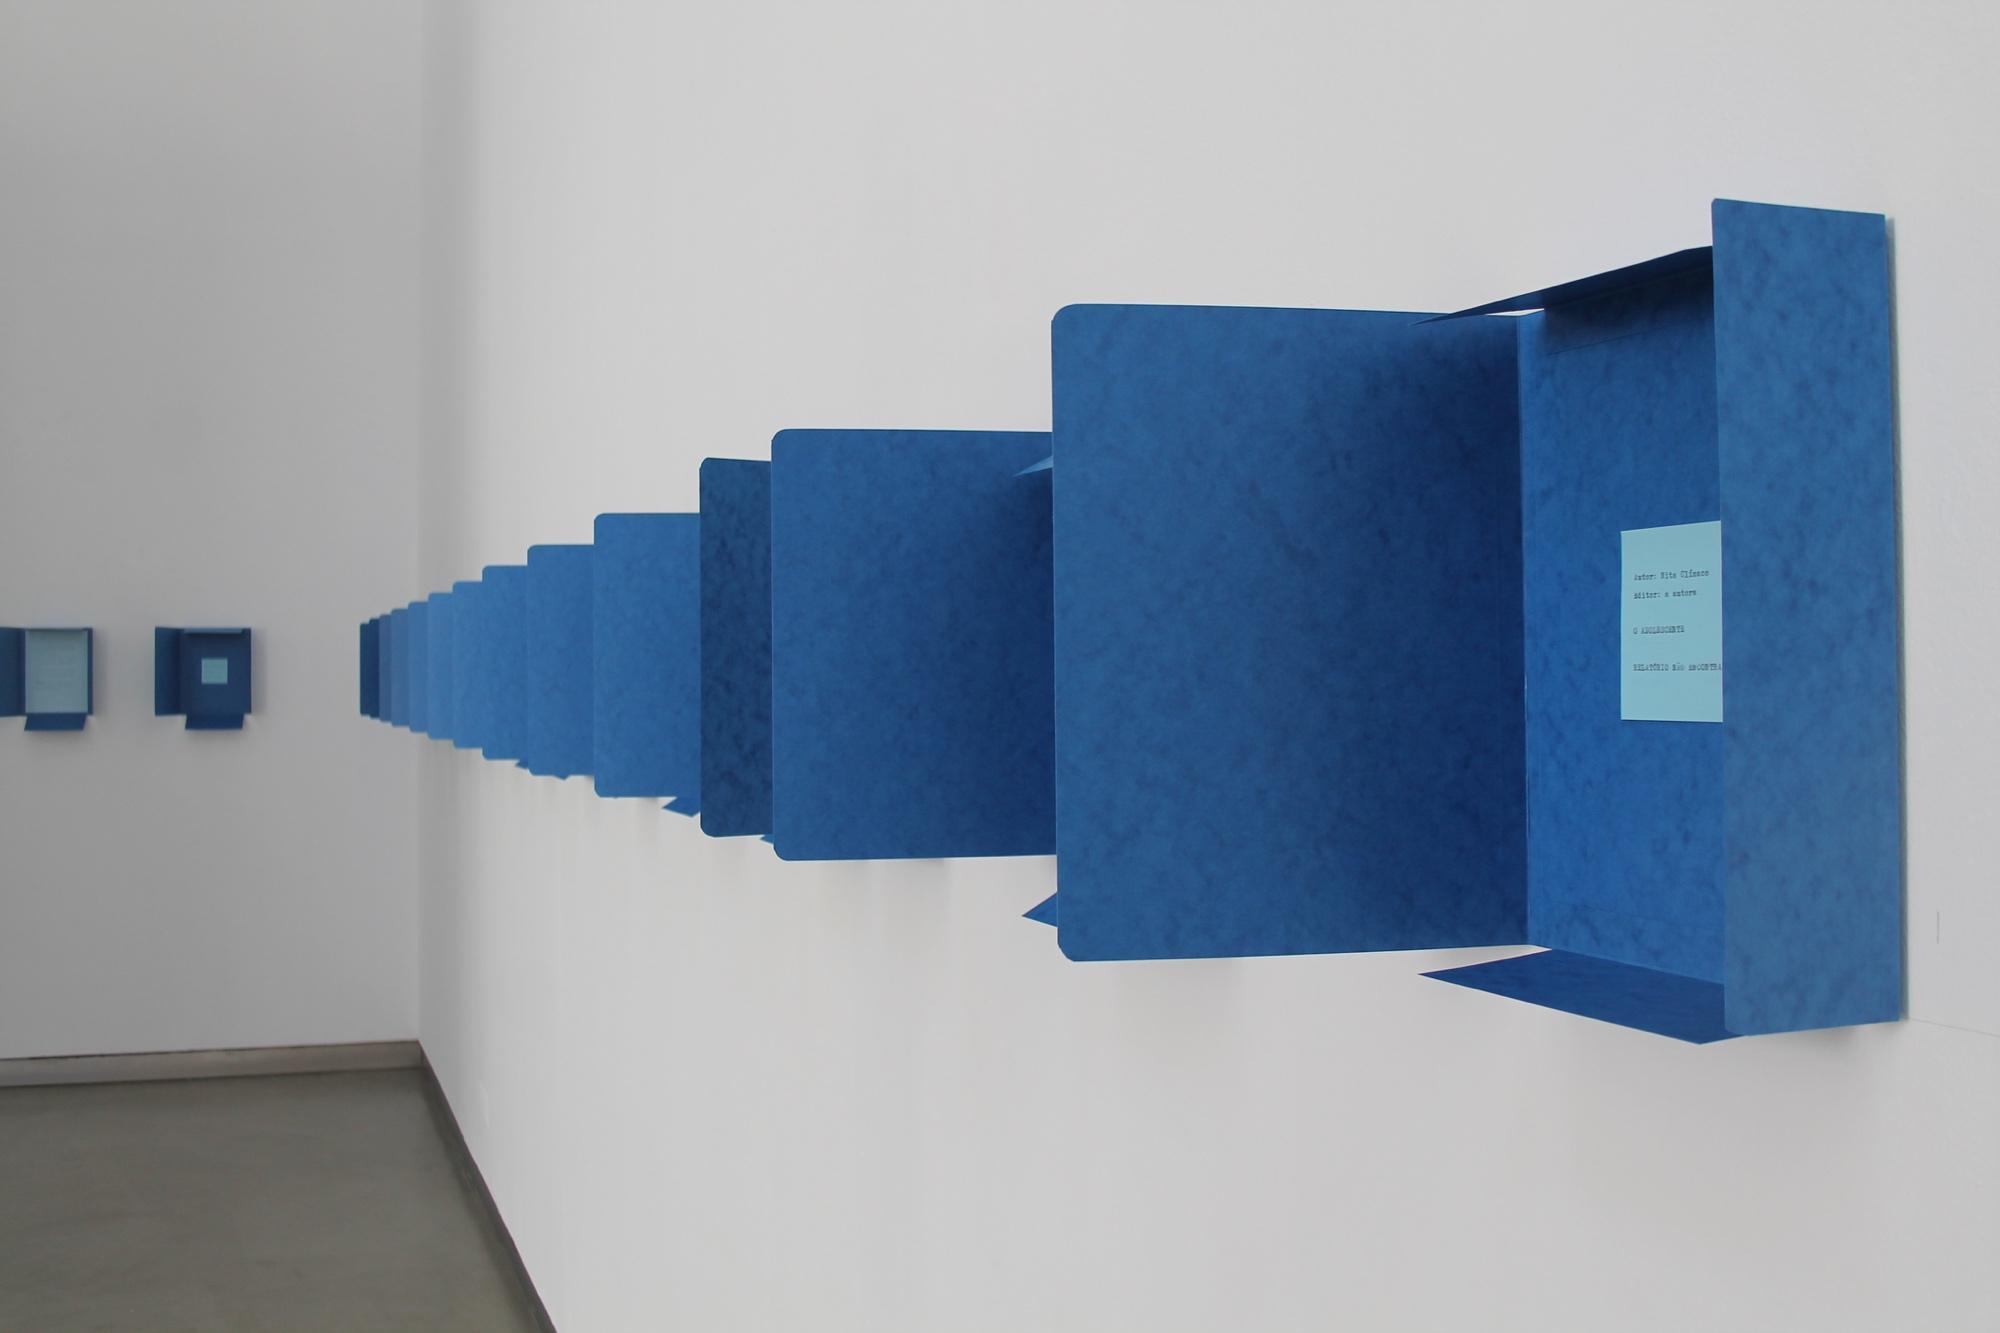 Marilá Dardot_O Leitor_2017_Instalation_(18) 32x24,5x32cm.jpg